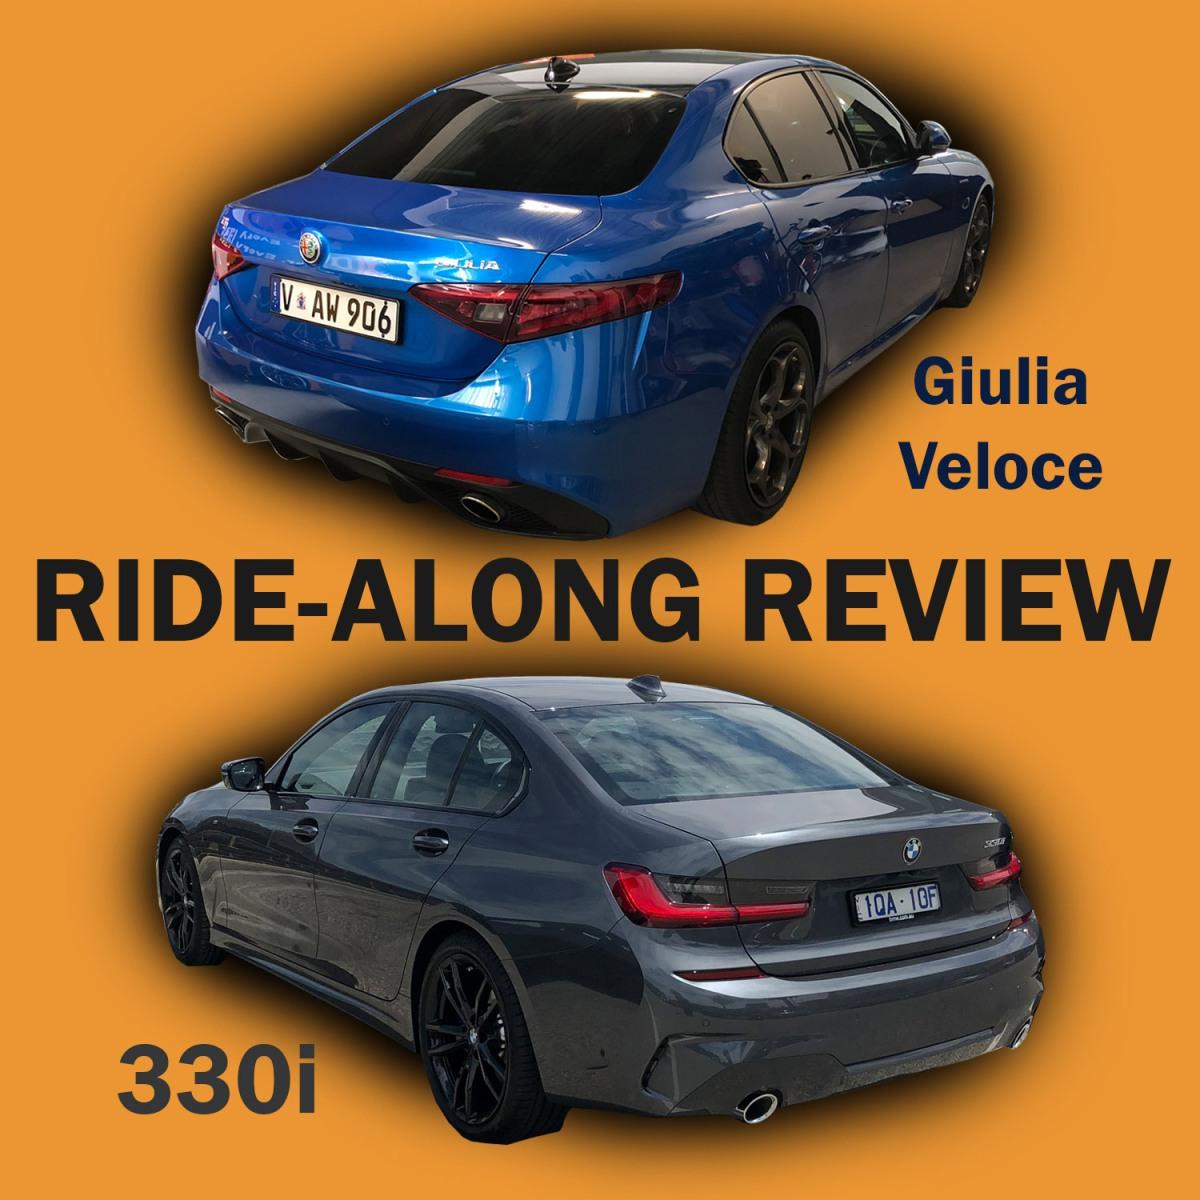 2019 BMW 330i Vs Alfa Romeo Giulia Veloce: Ride-along